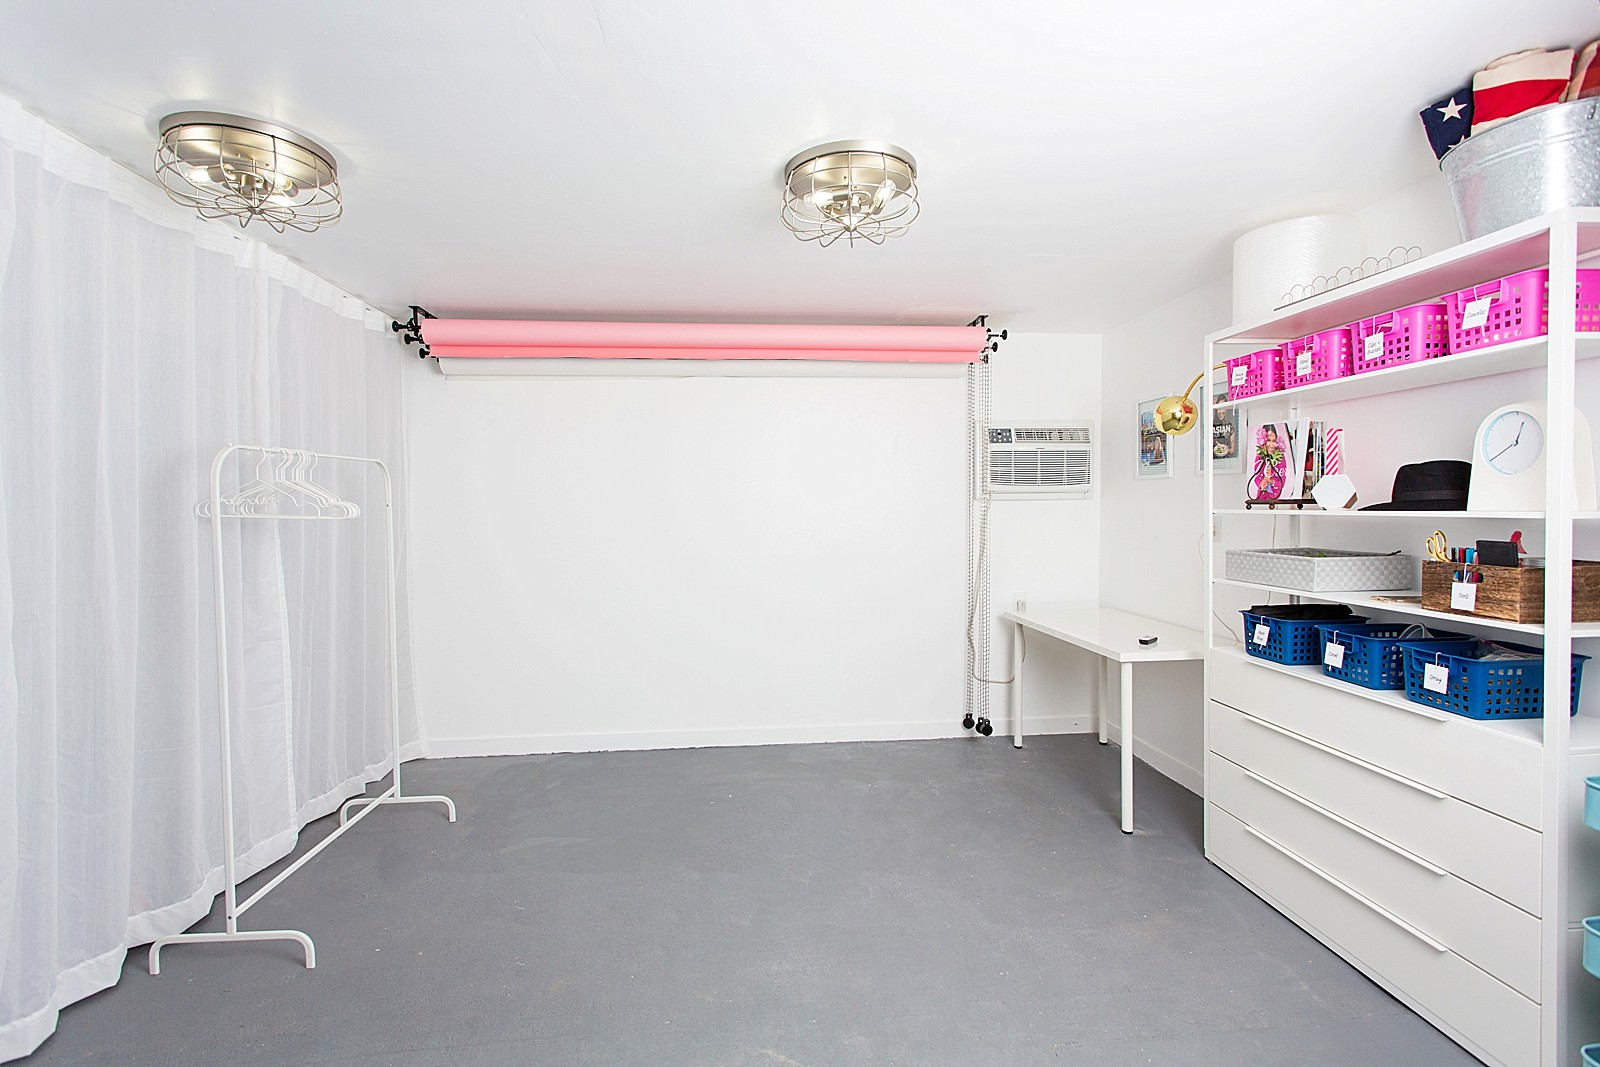 home-photography-studio-storage-tour-photographer-blogger-arizona-diana-elizabeth-blog-1986